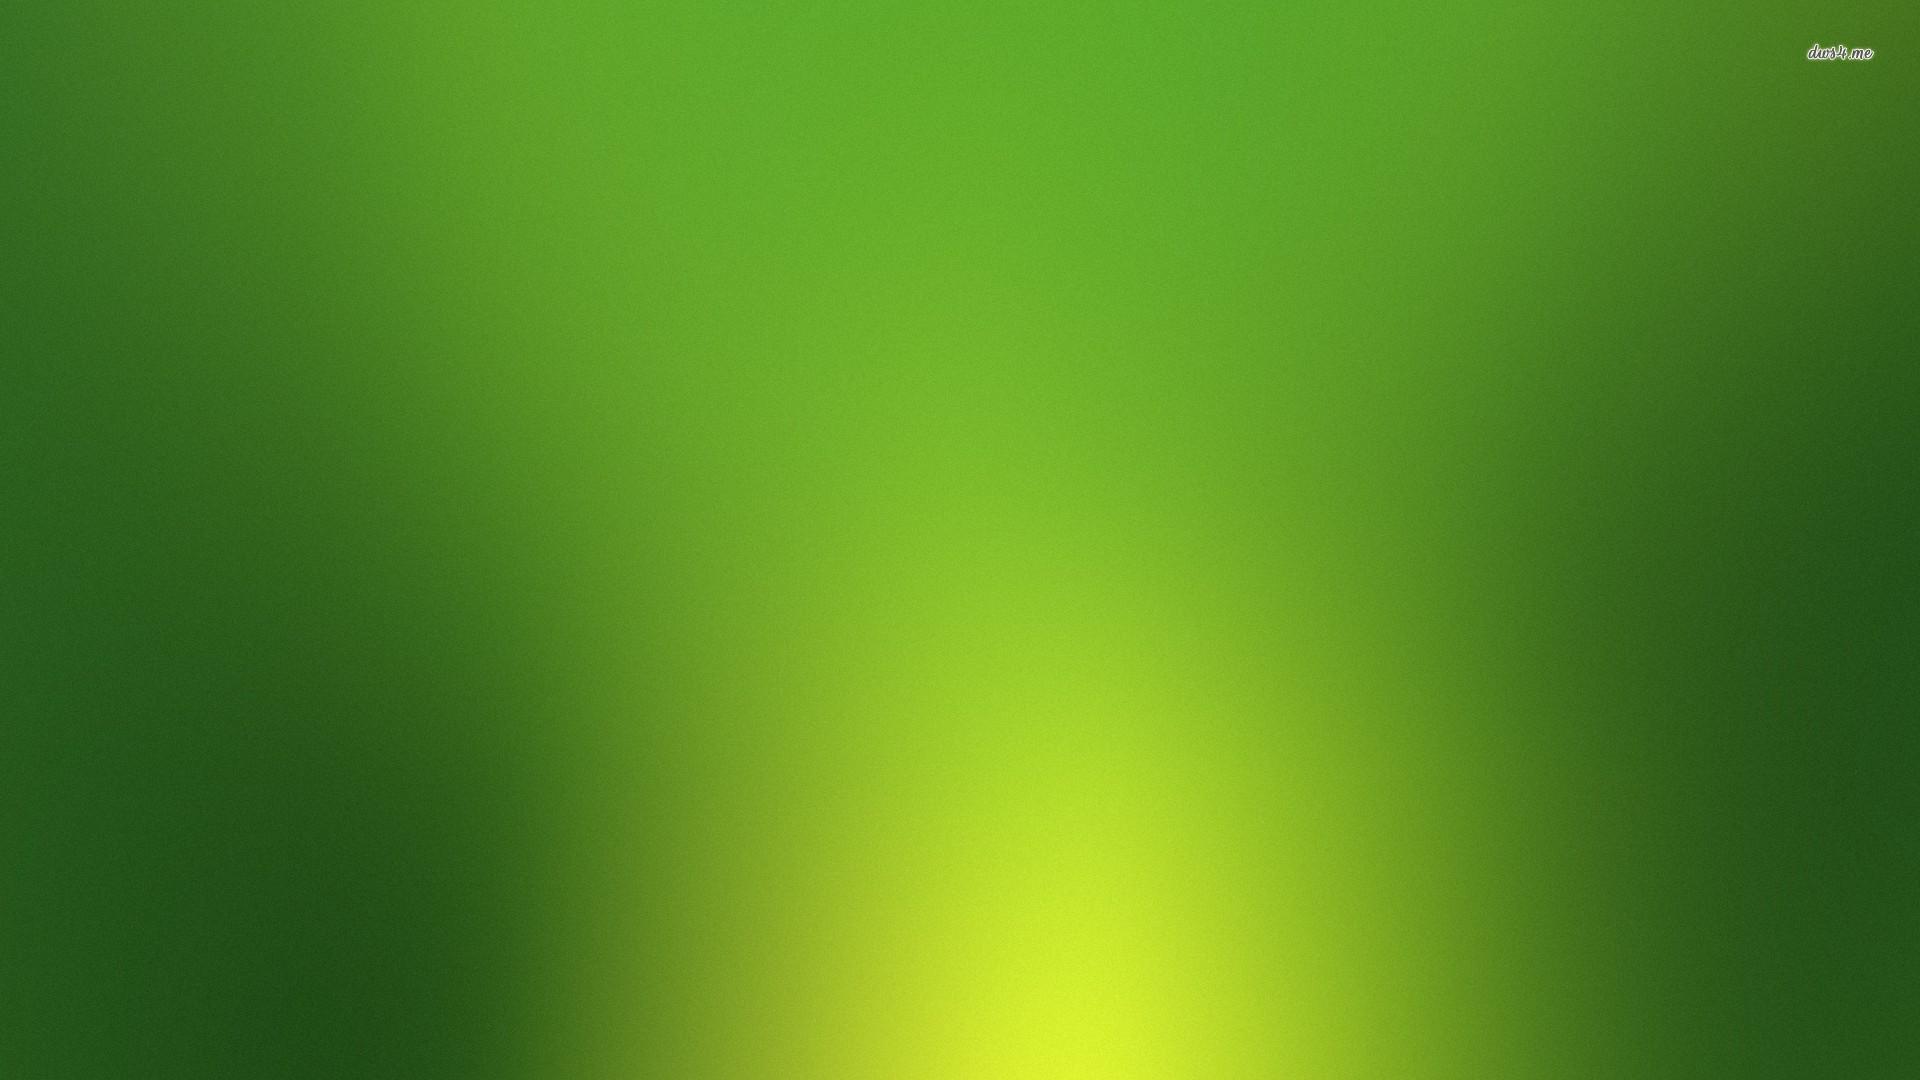 Gorillaz Iphone Wallpaper White Gradient Background 183 ① Download Free Beautiful